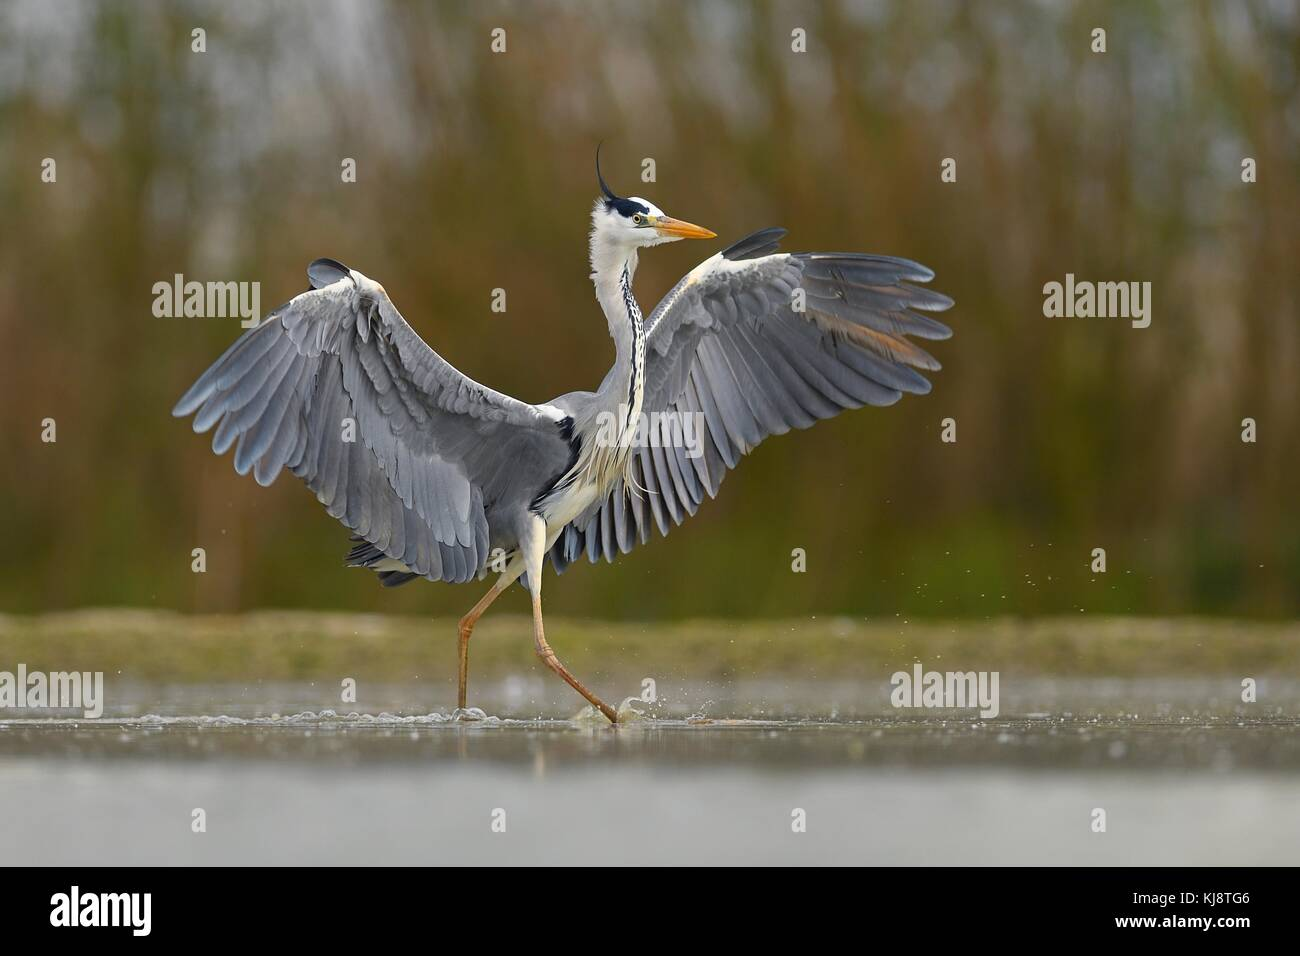 Grey heron (Ardea cinerea), walks in the water, National Park Kiskunsag, Hungary - Stock Image